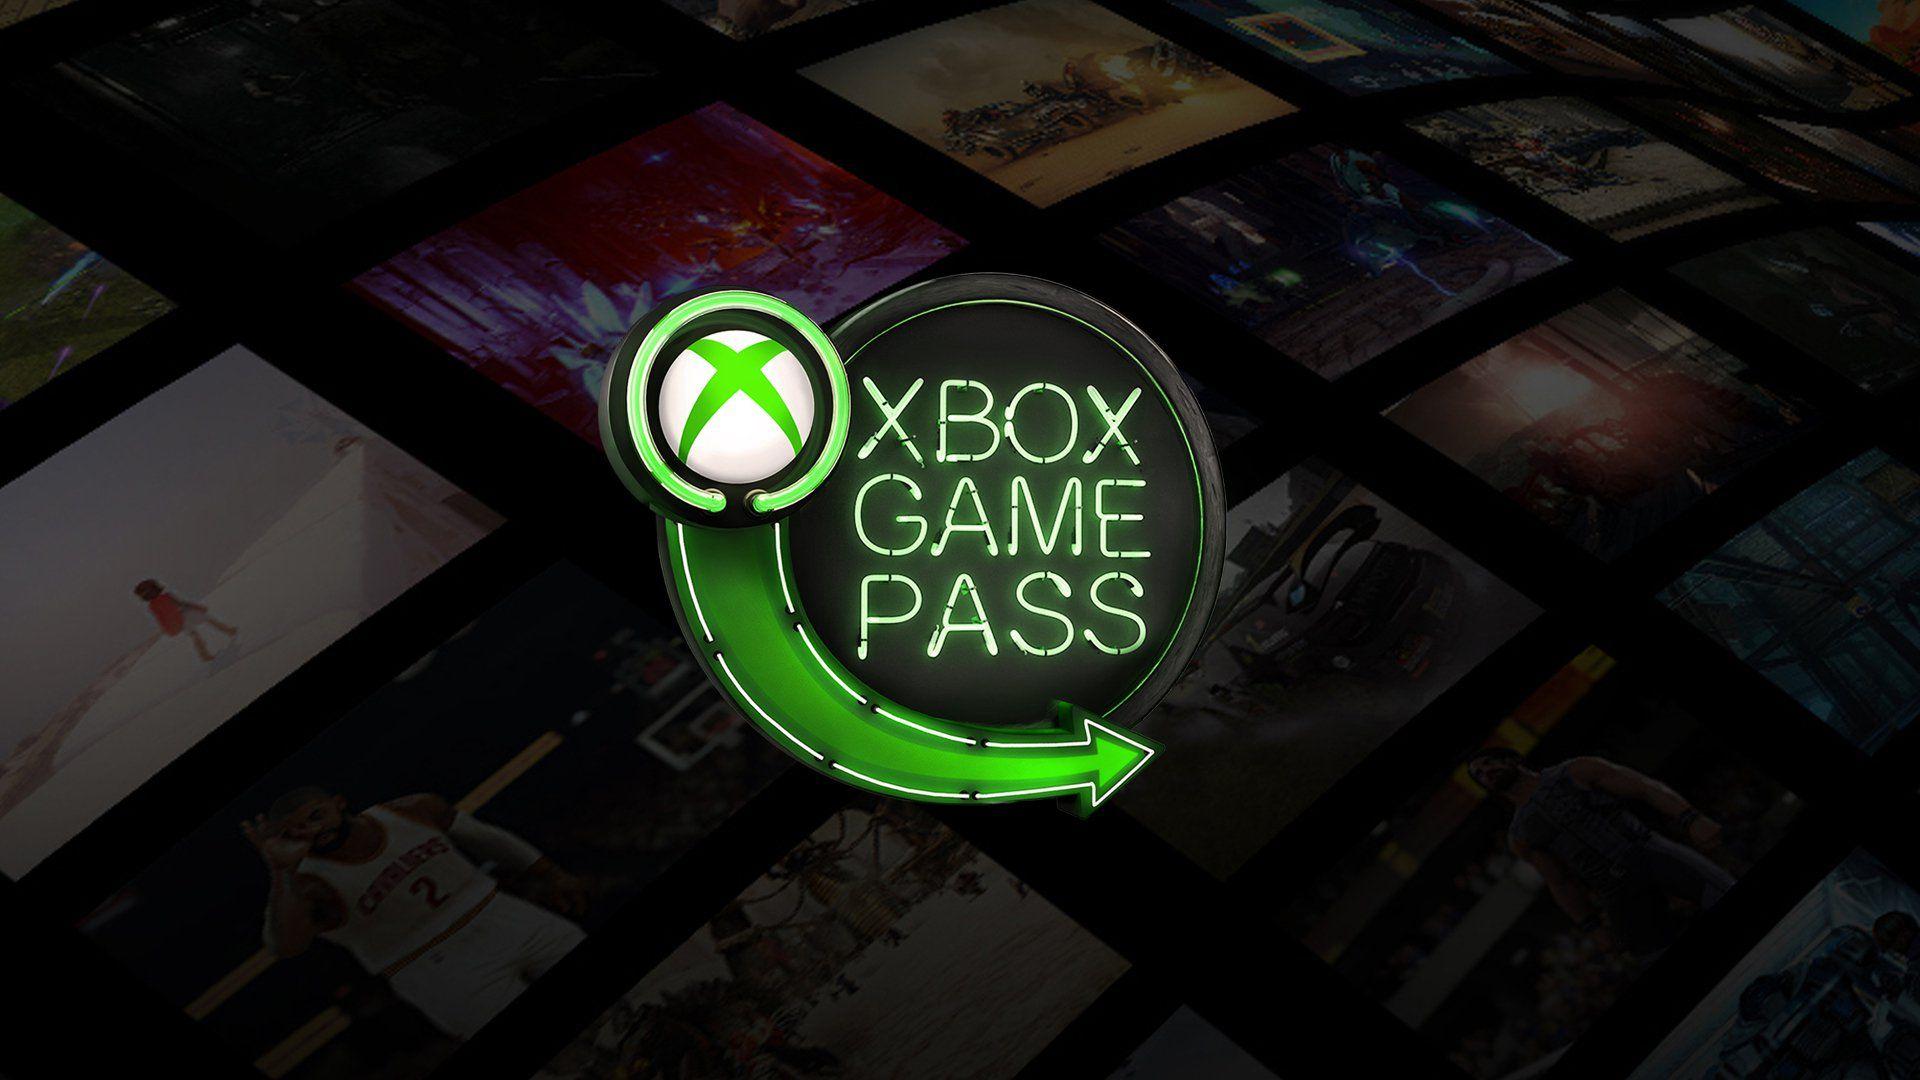 Microsoft May Be Bringing Xbox Game Pass To Pc Game Pass Xbox Games Xbox Pistol whip 2089 pc gamer wallpaper